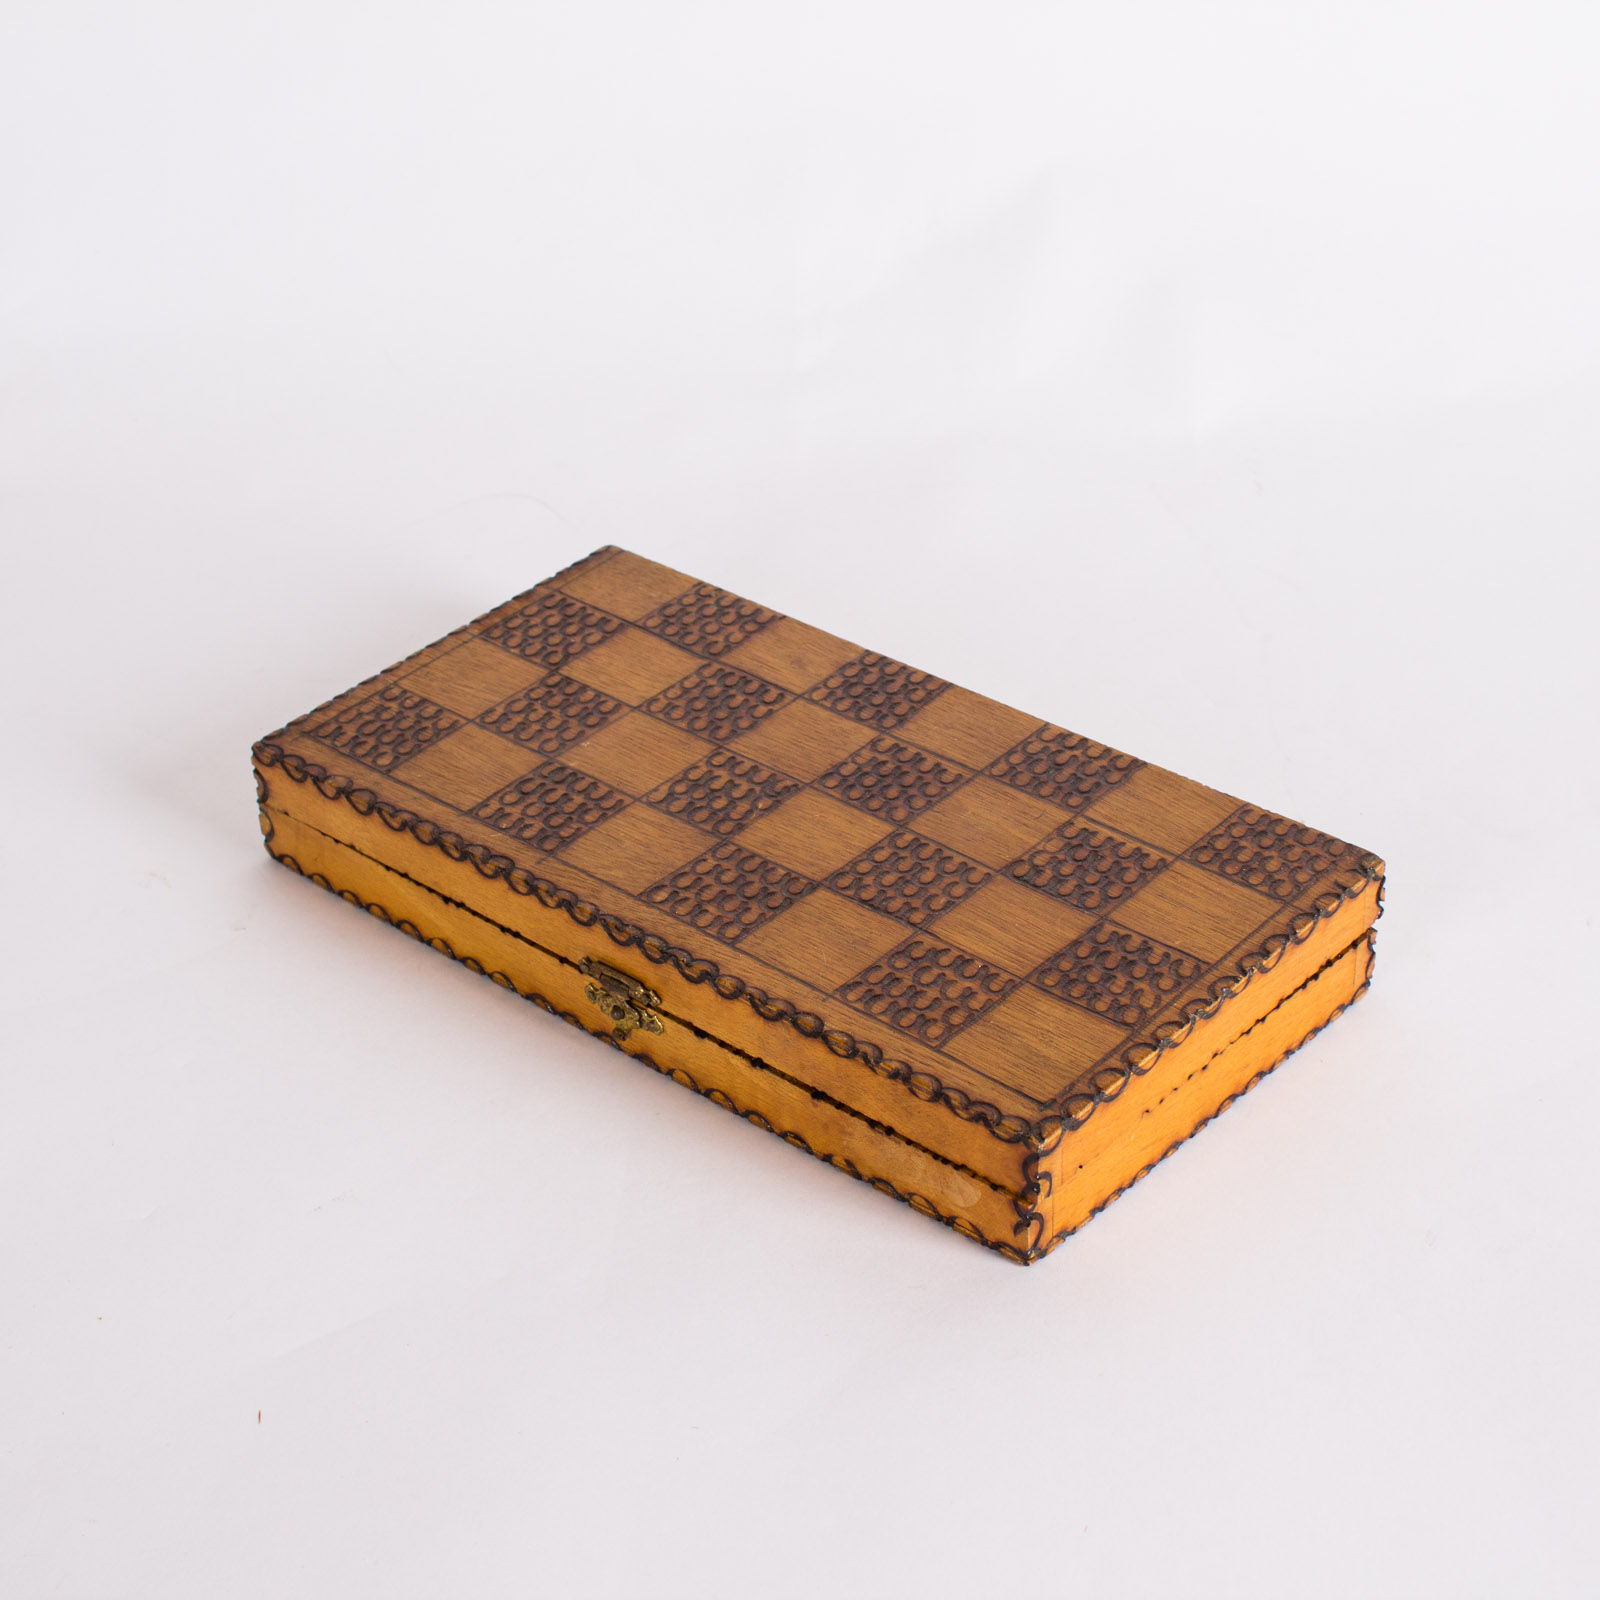 Vintage Teppich Brass Chess Set Made in Israel  EBTH